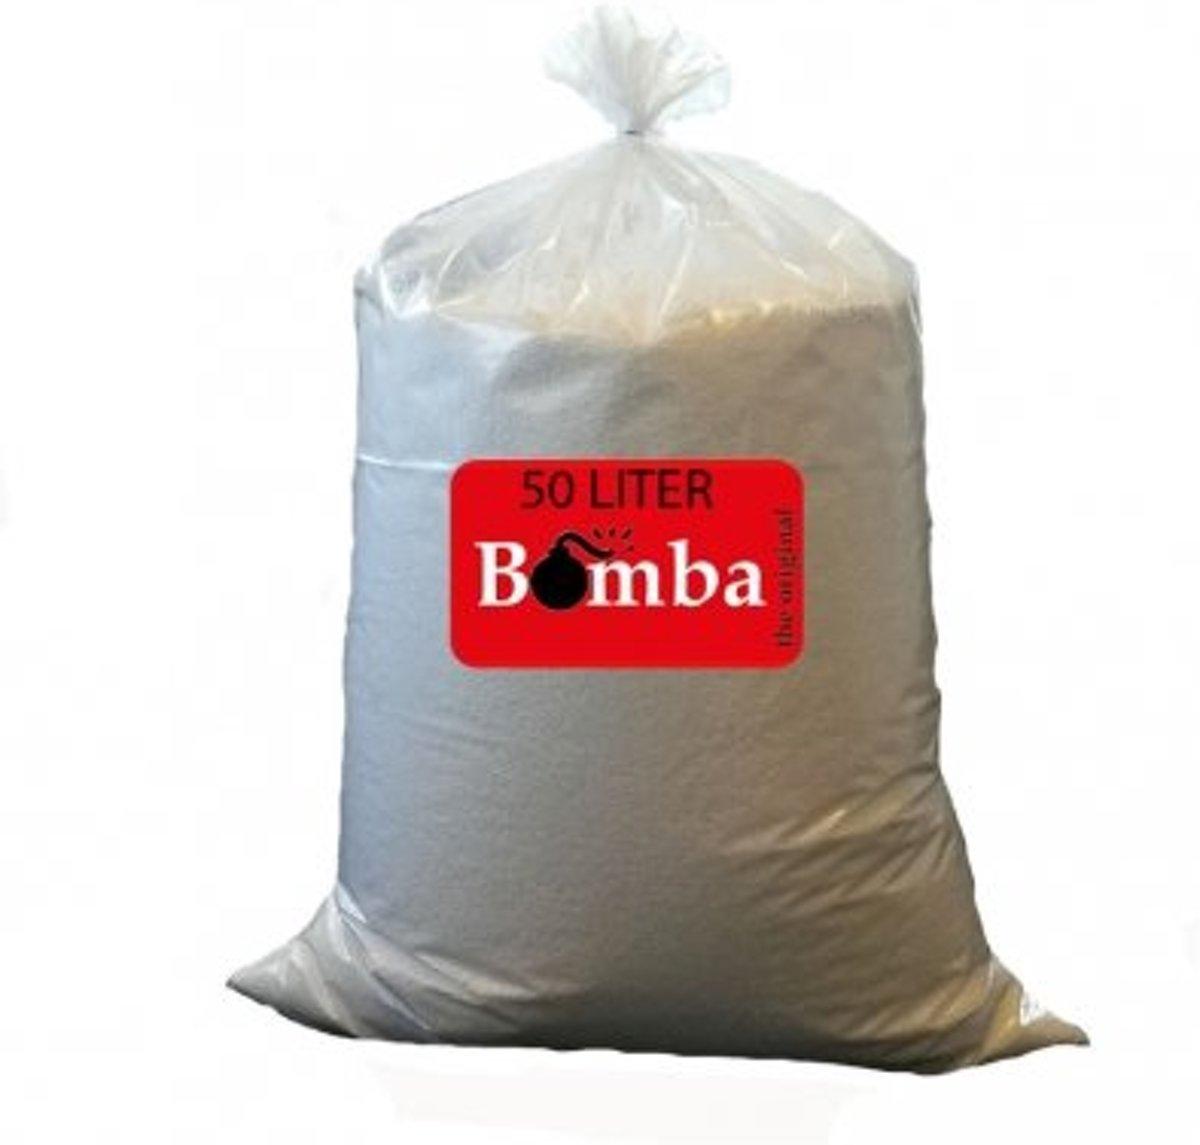 Bomba EPS zitzak vulling zitzakvulling 50 ltr. kopen